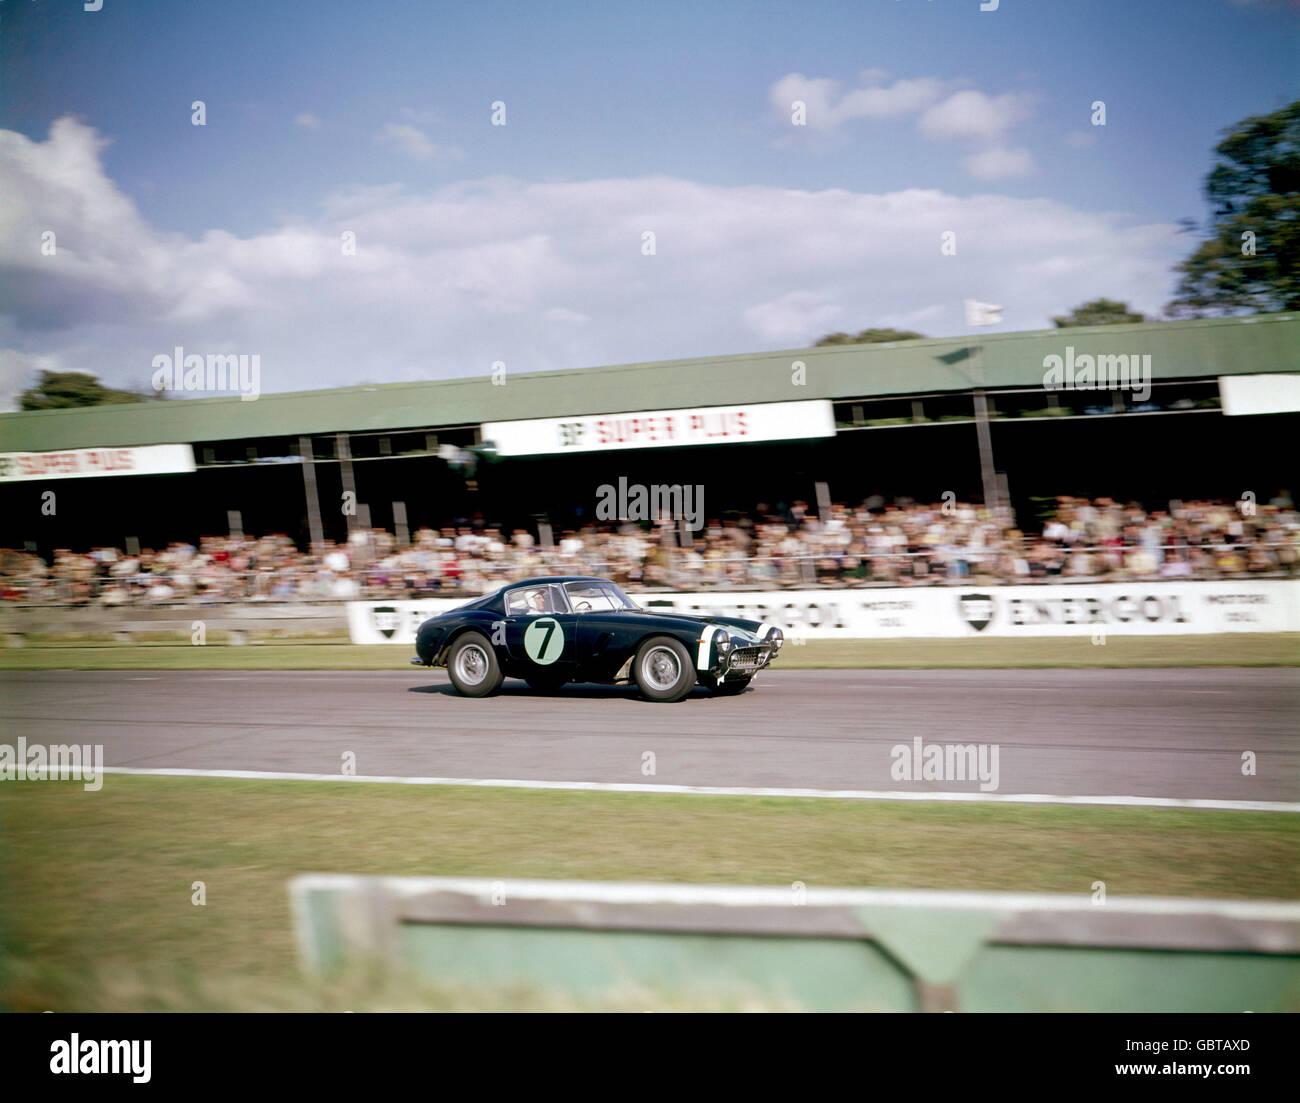 Motor Racing - RAC Tourist Trophy Race - Goodwood - Stock Image